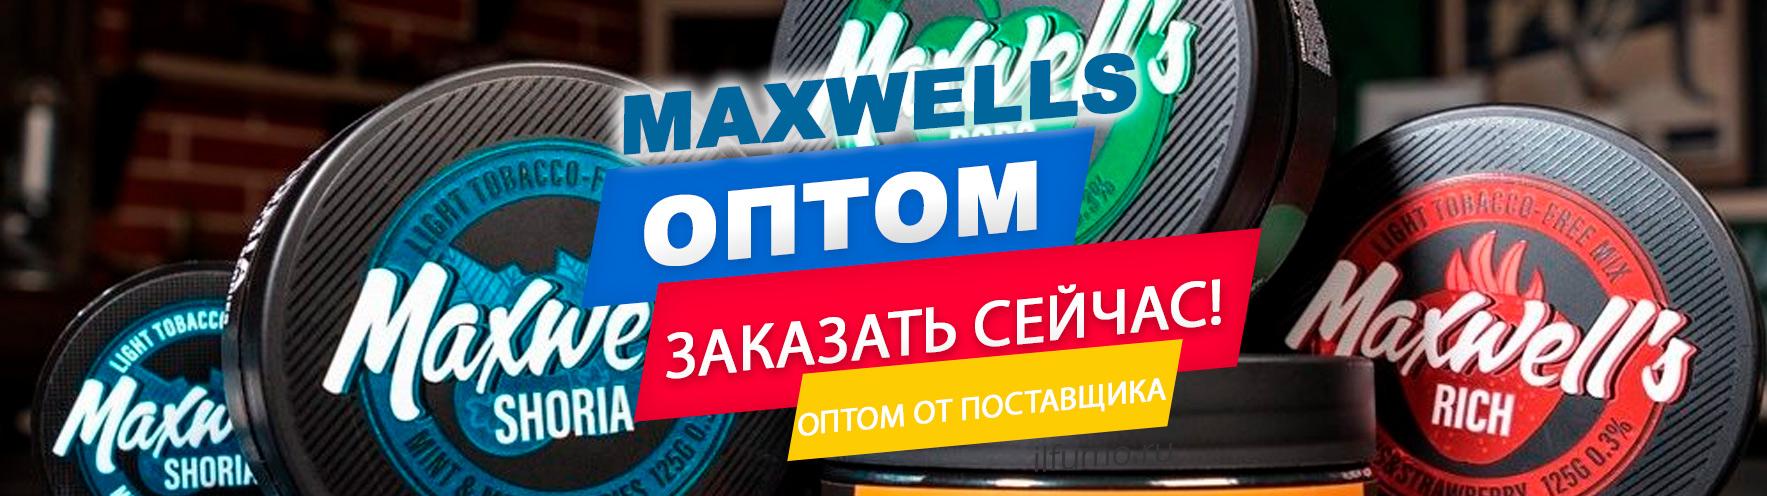 maxwells optom - Кальянный Maxwells